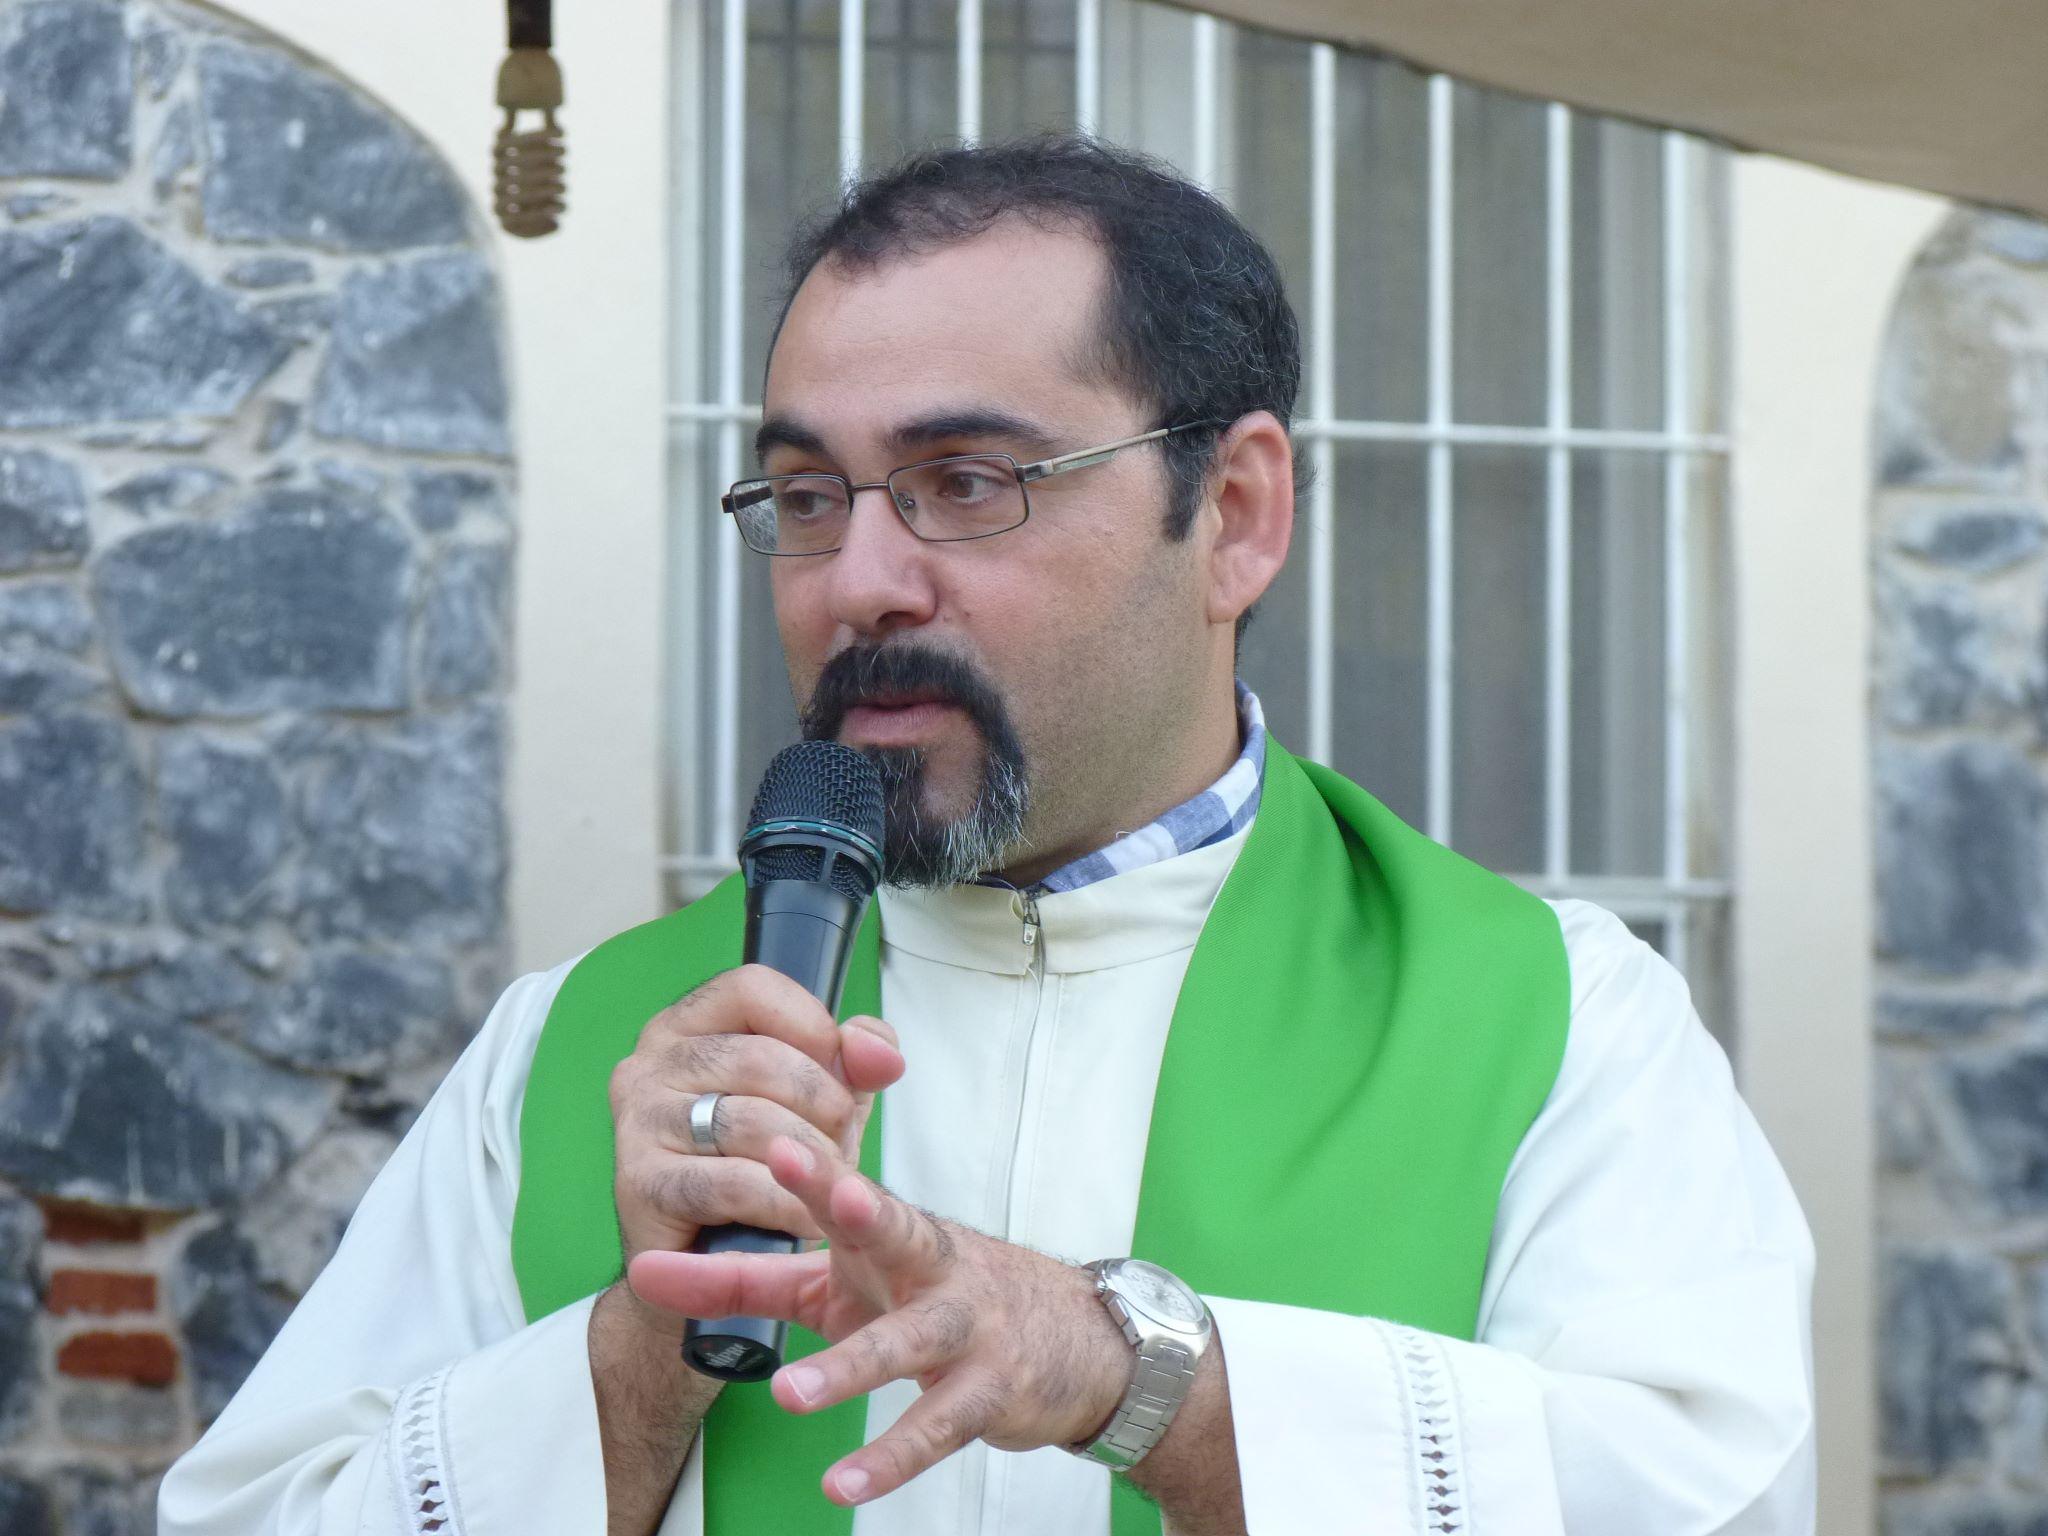 Don Massimo Cabua